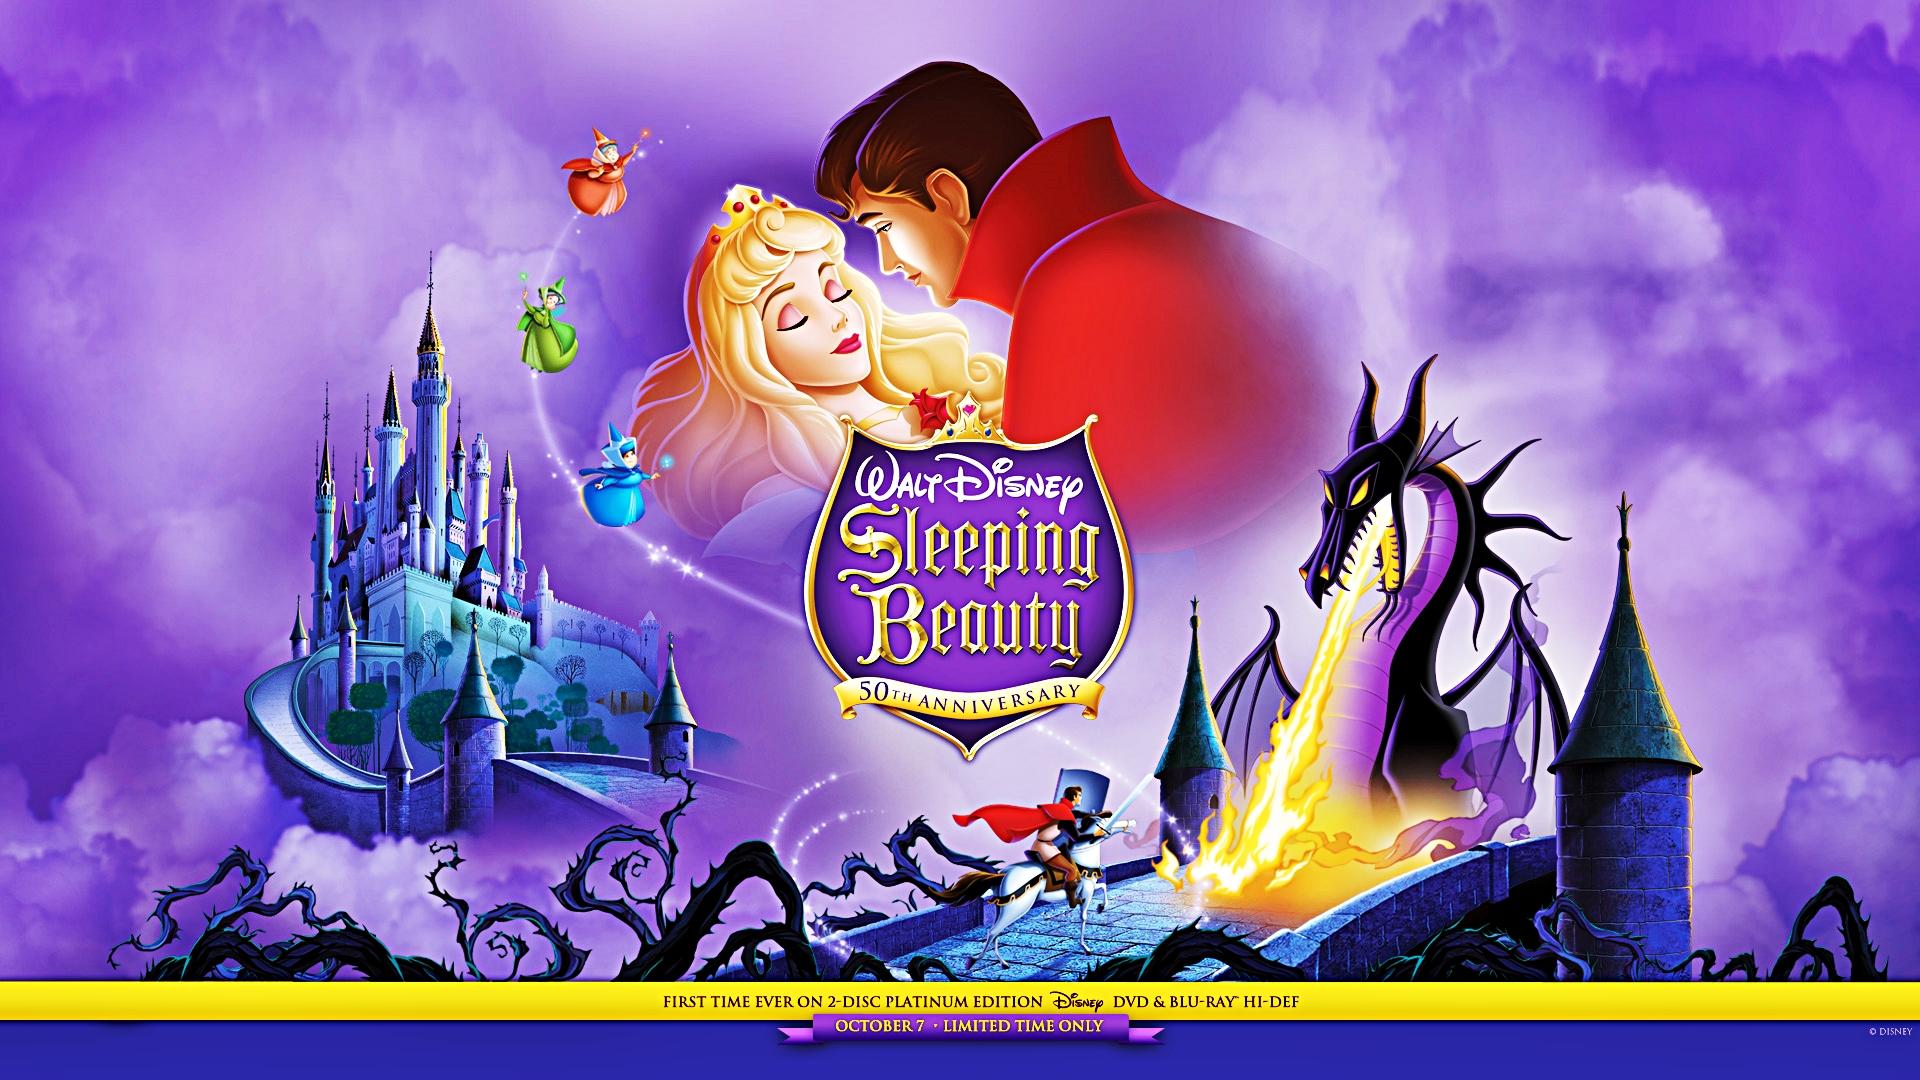 Disney Wallpapers   Sleeping Beauty   Walt Disney Characters Wallpaper 1920x1080